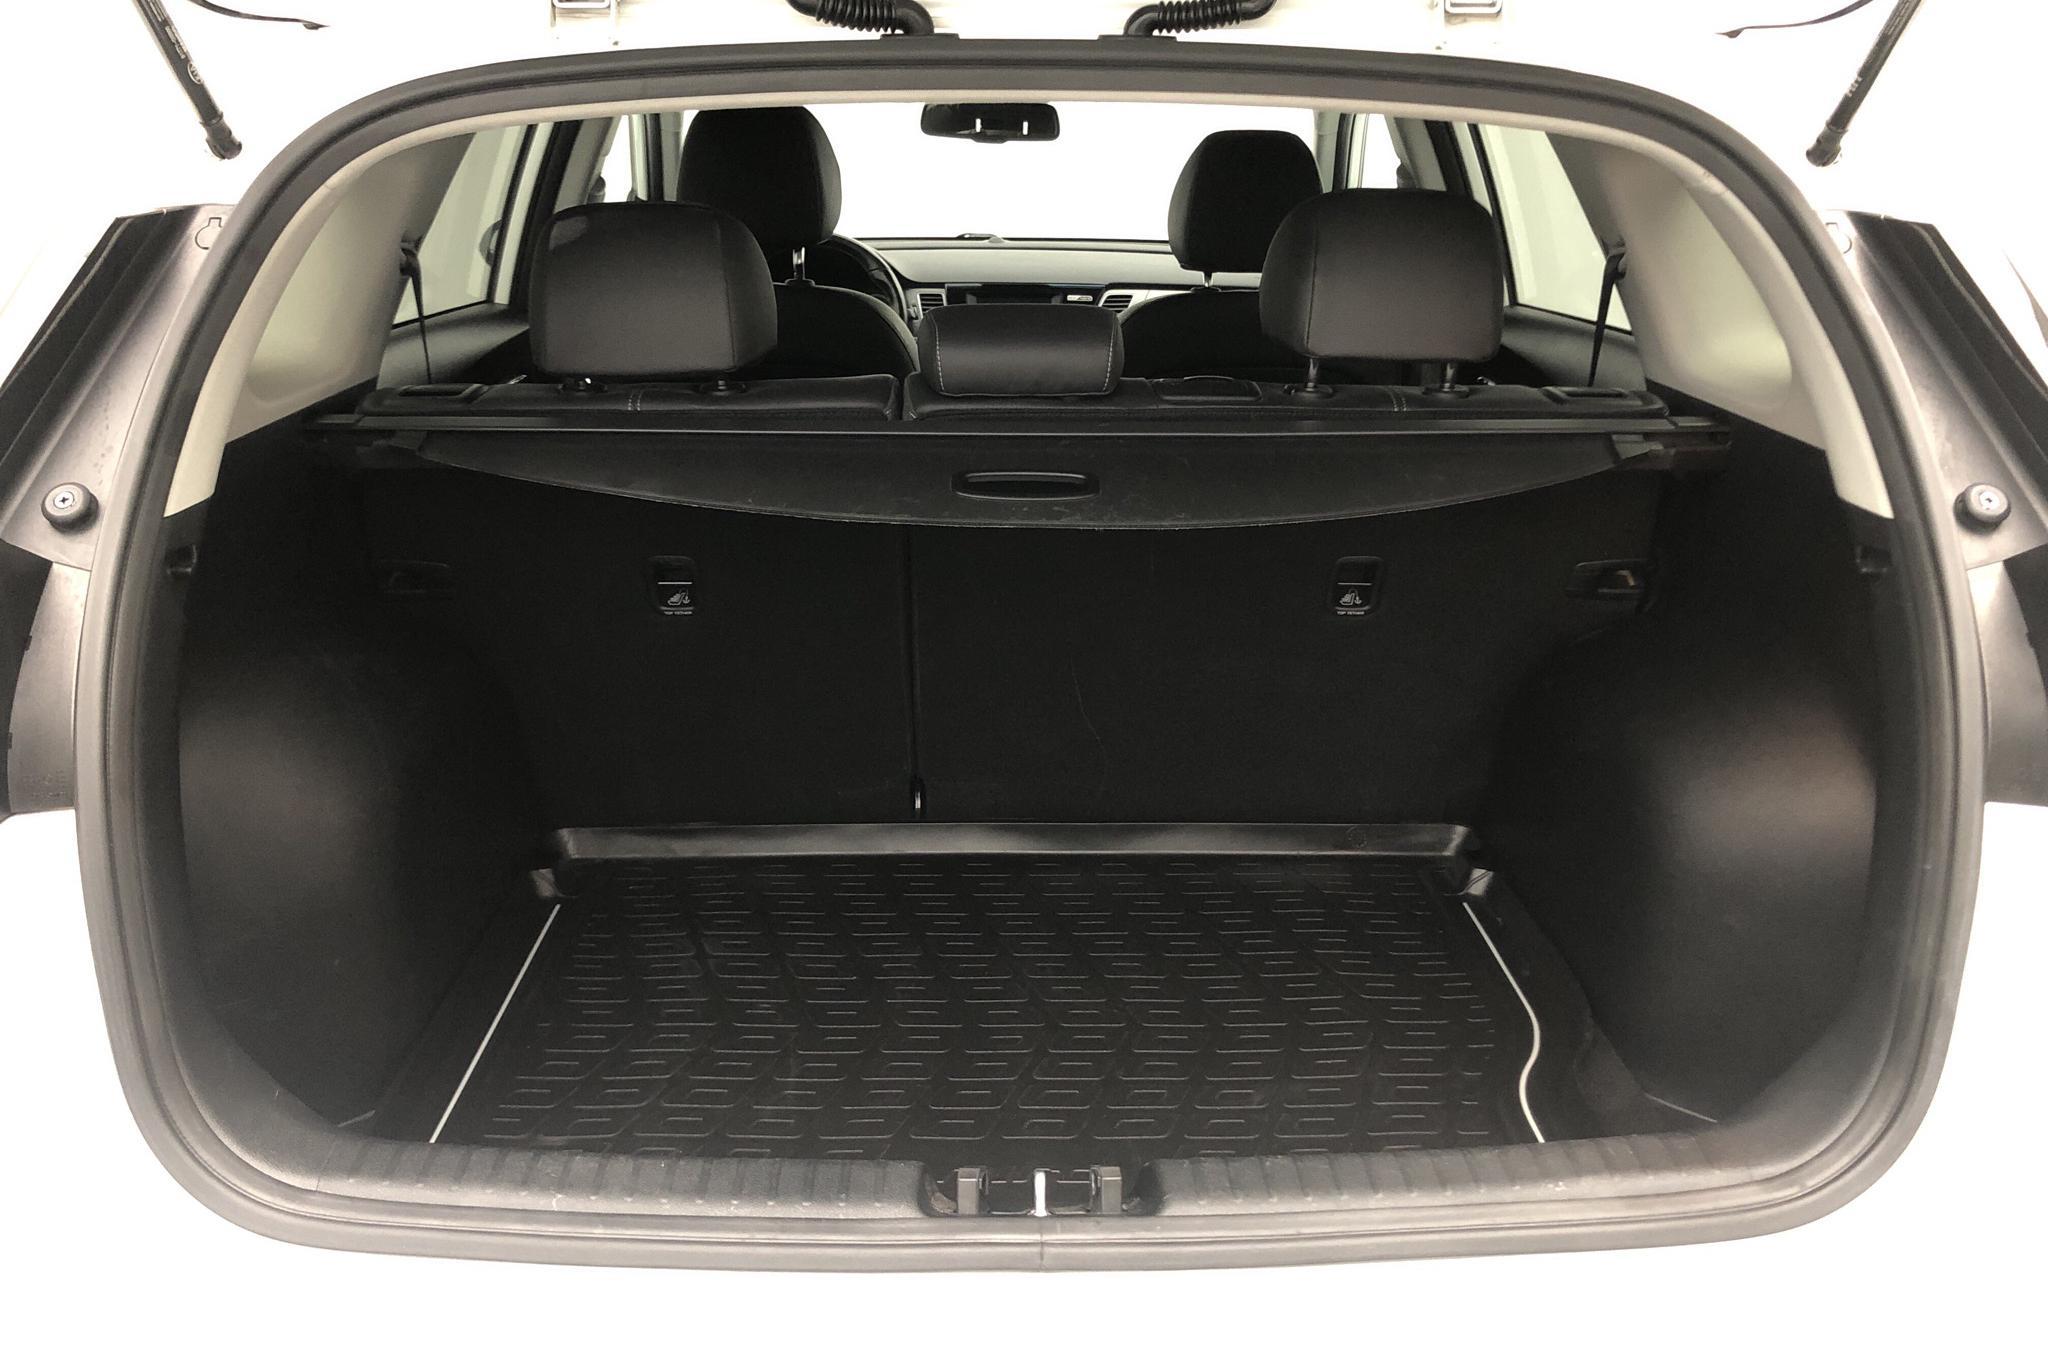 KIA Niro Hybrid 1.6 (141hk) - 8 401 mil - Automat - vit - 2018